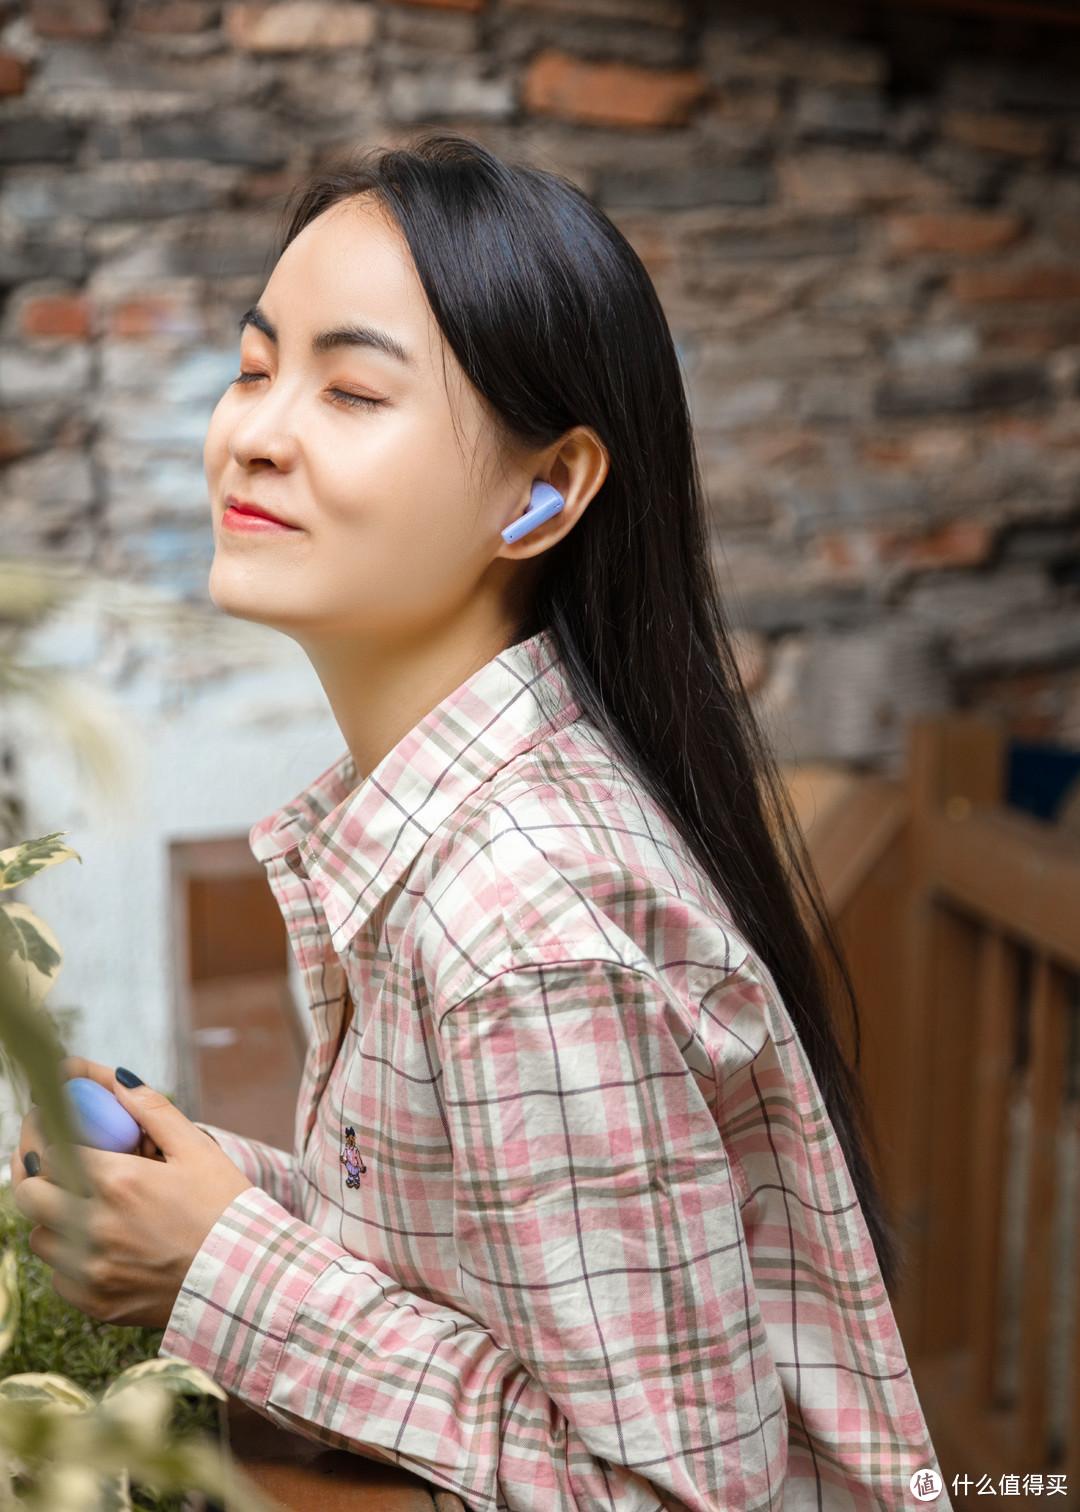 Liavs 腾讯怪奇鹅定制TWS蓝牙耳机——超迷你蓝牙耳机